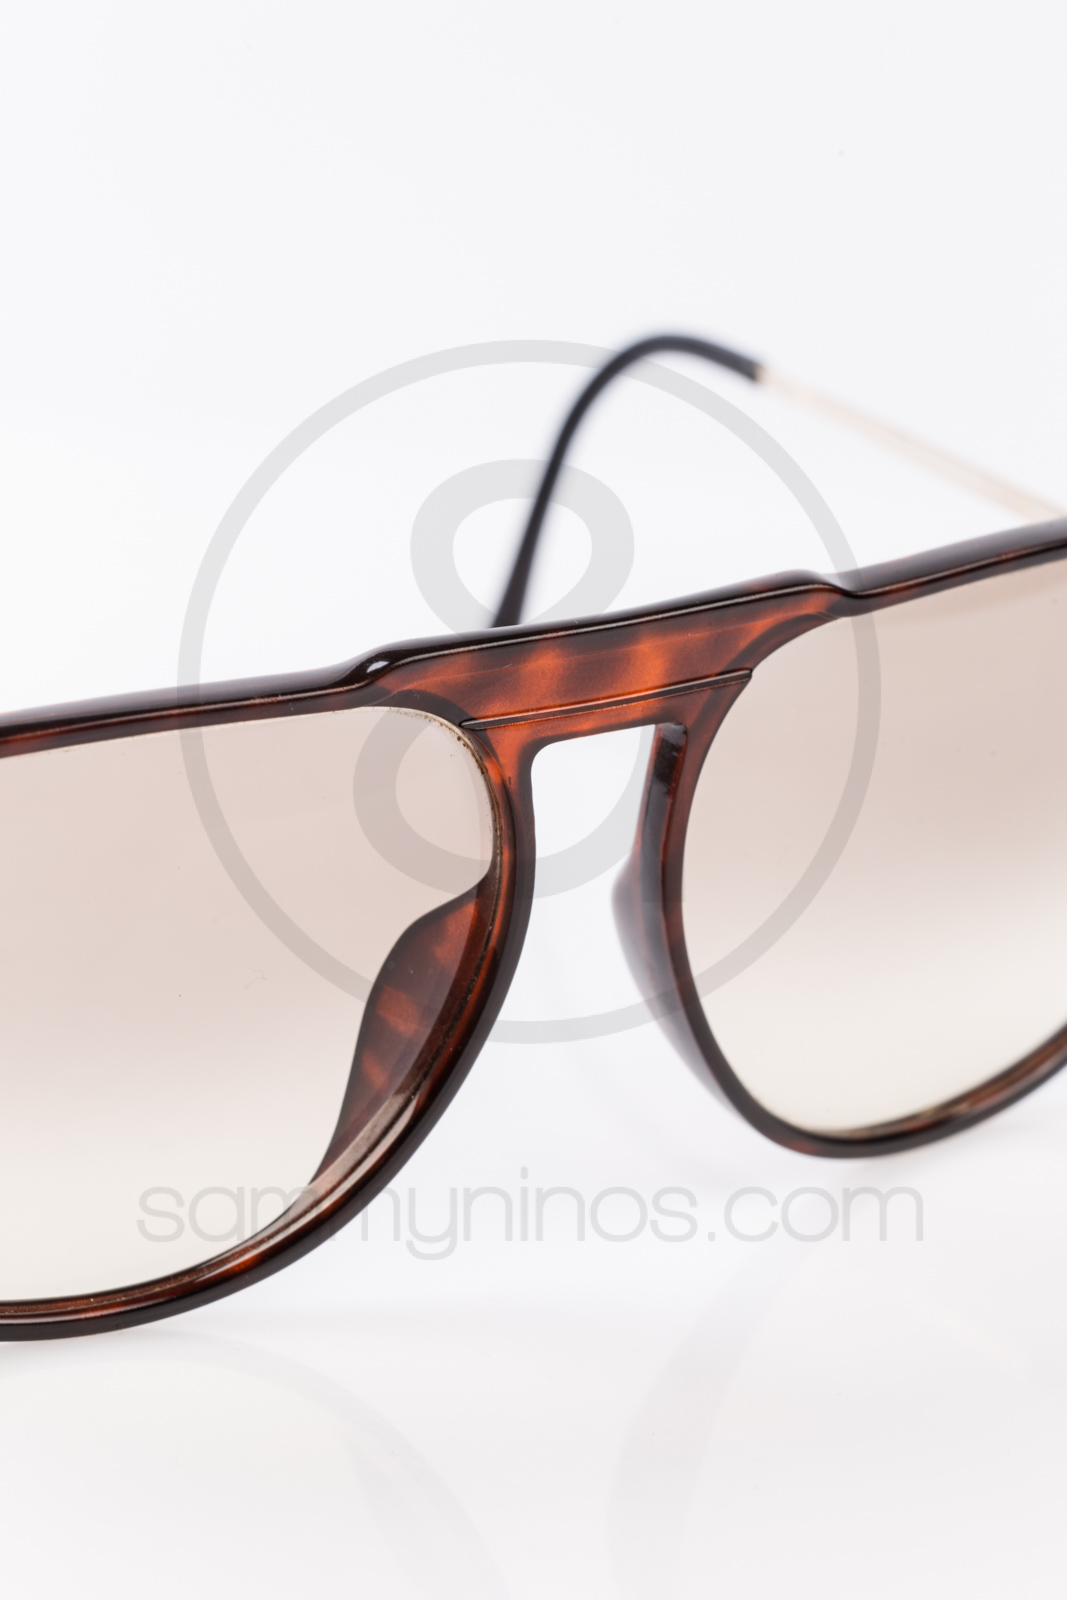 e0510fba160 Christian Dior Sunglasses Vintage